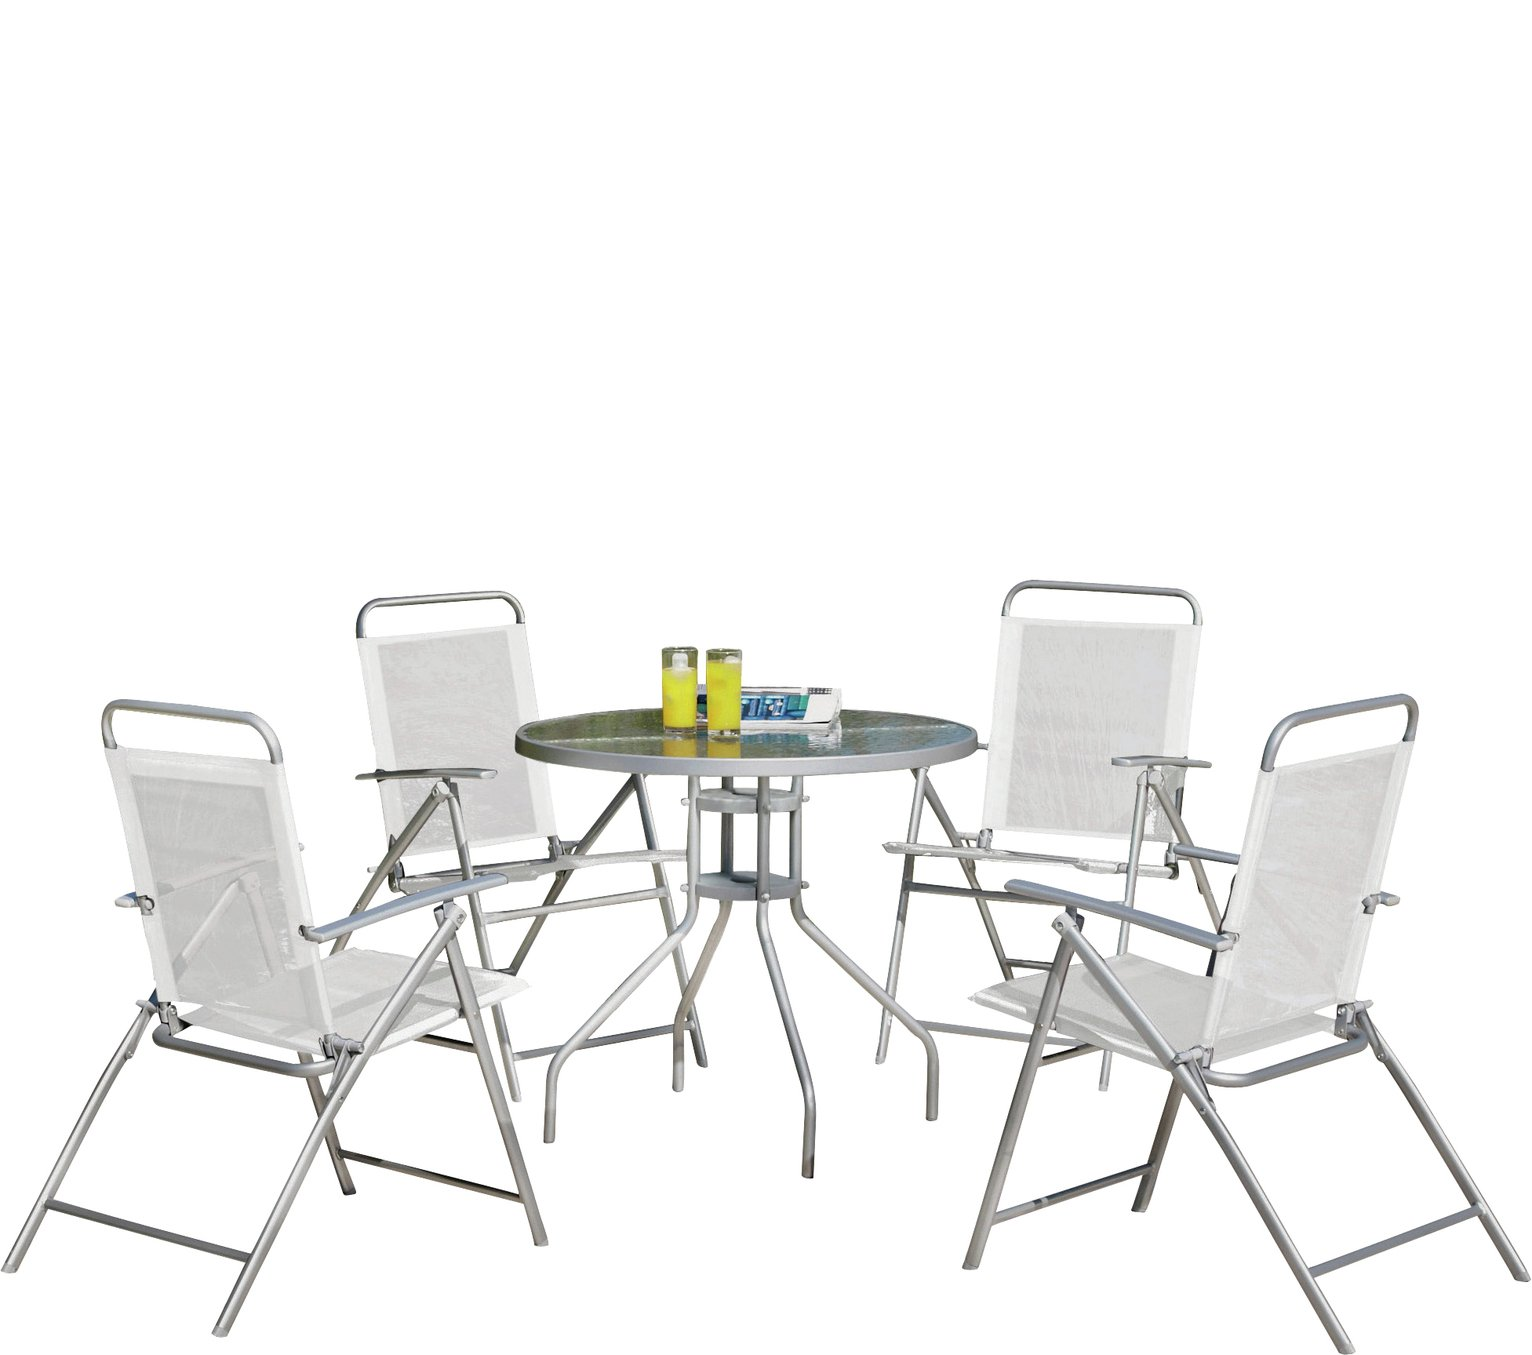 Simple Value - 4 Seater Patio Furniture Set lowest price